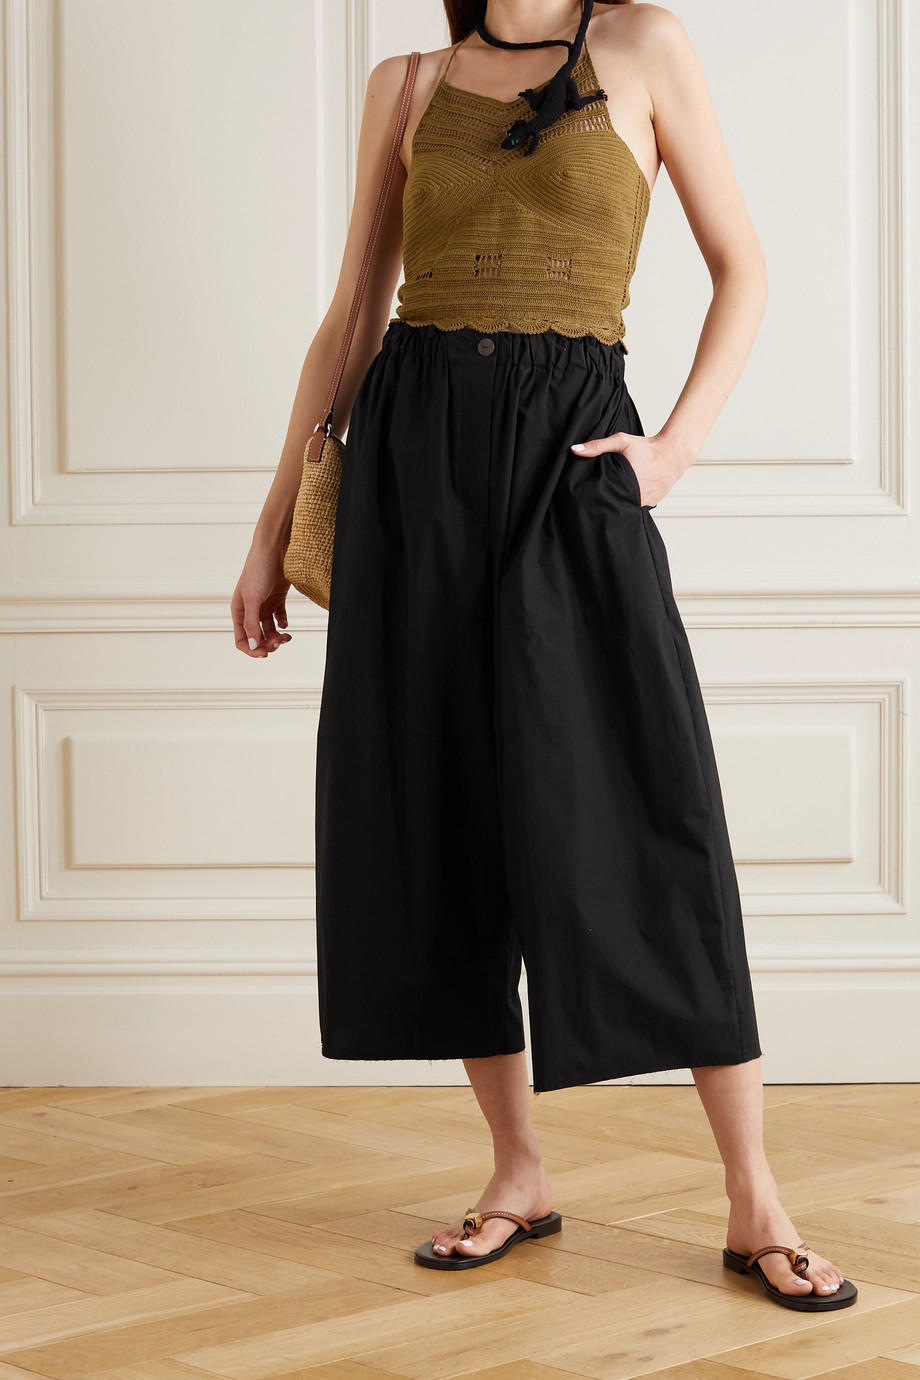 Loewe + Paula's Ibiza cropped cotton wide-leg pants